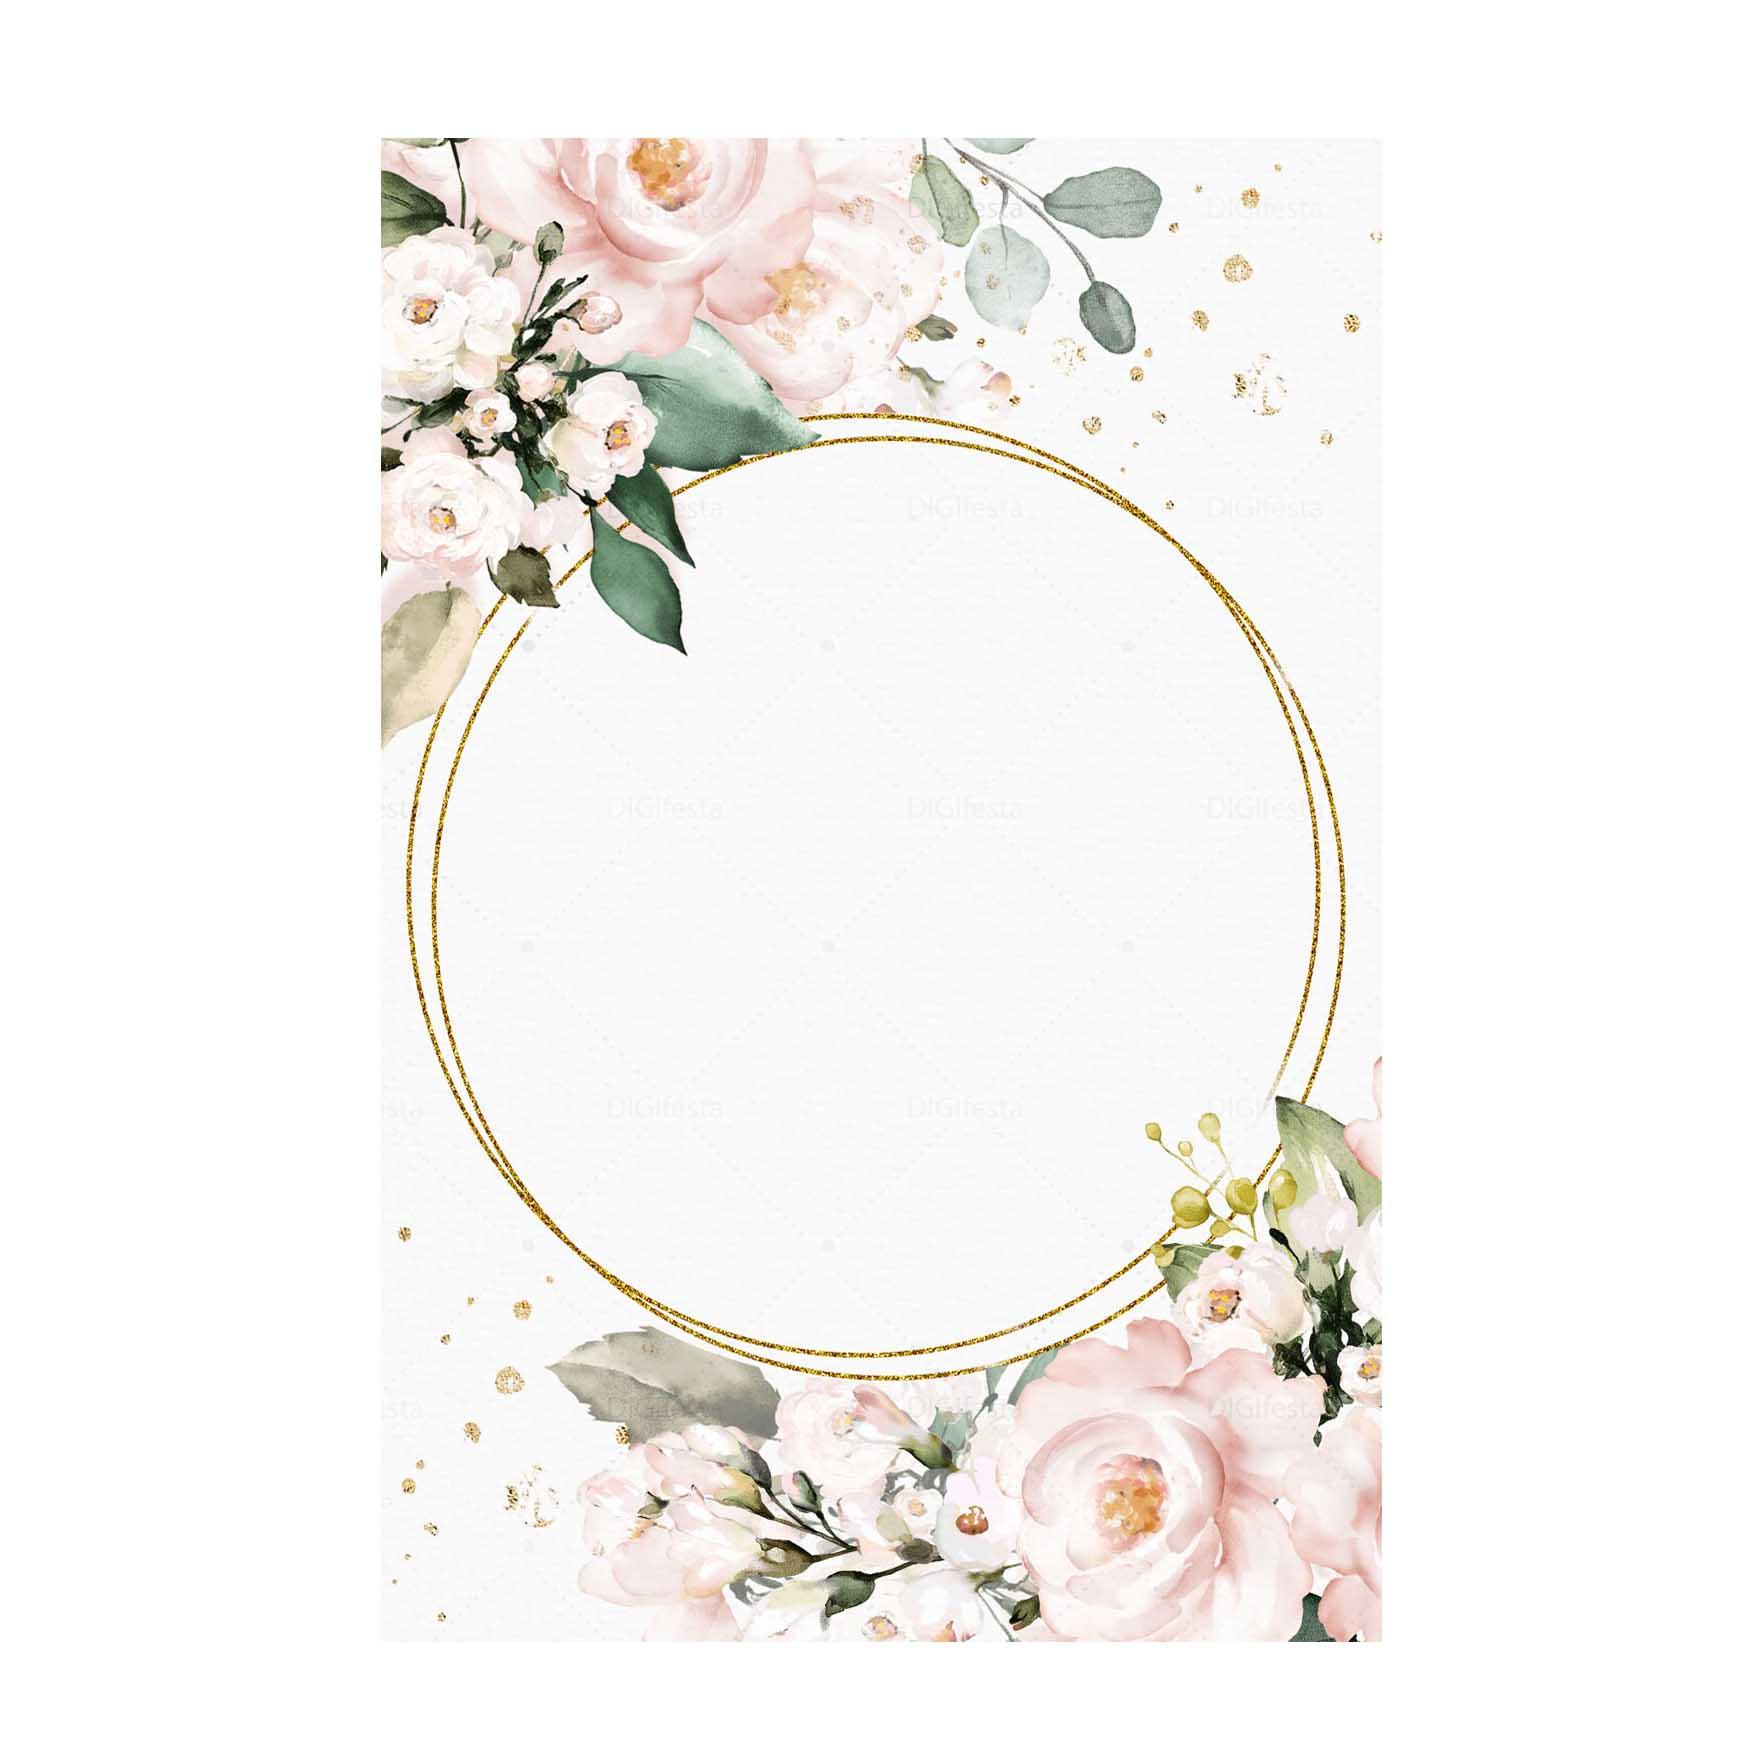 Convite Glitter Floral Grátis para Editar e imprimir